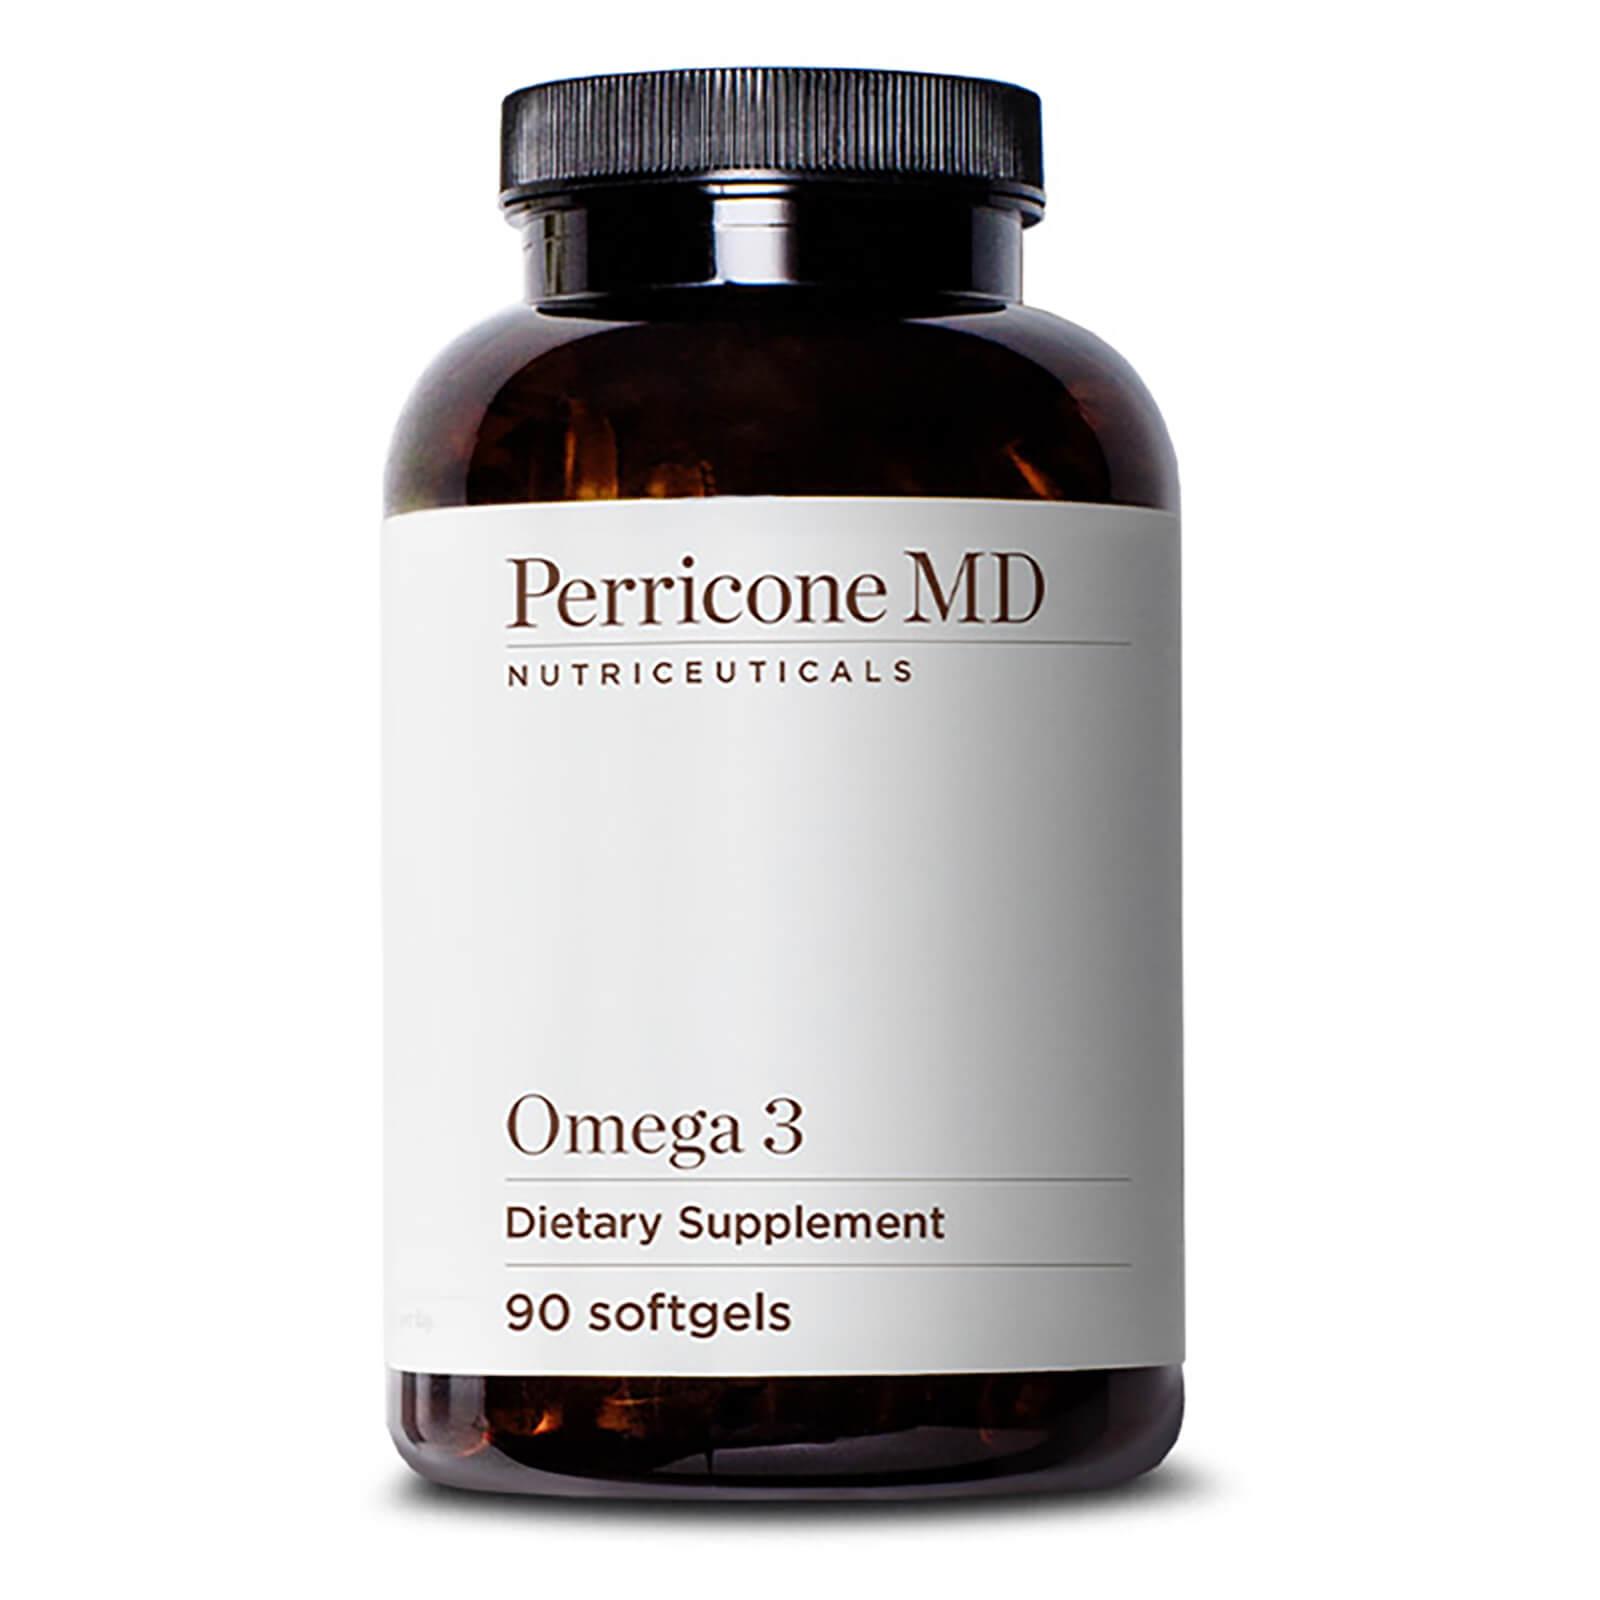 Perricone MD integratore di omega - 1 mese (90 capsule)